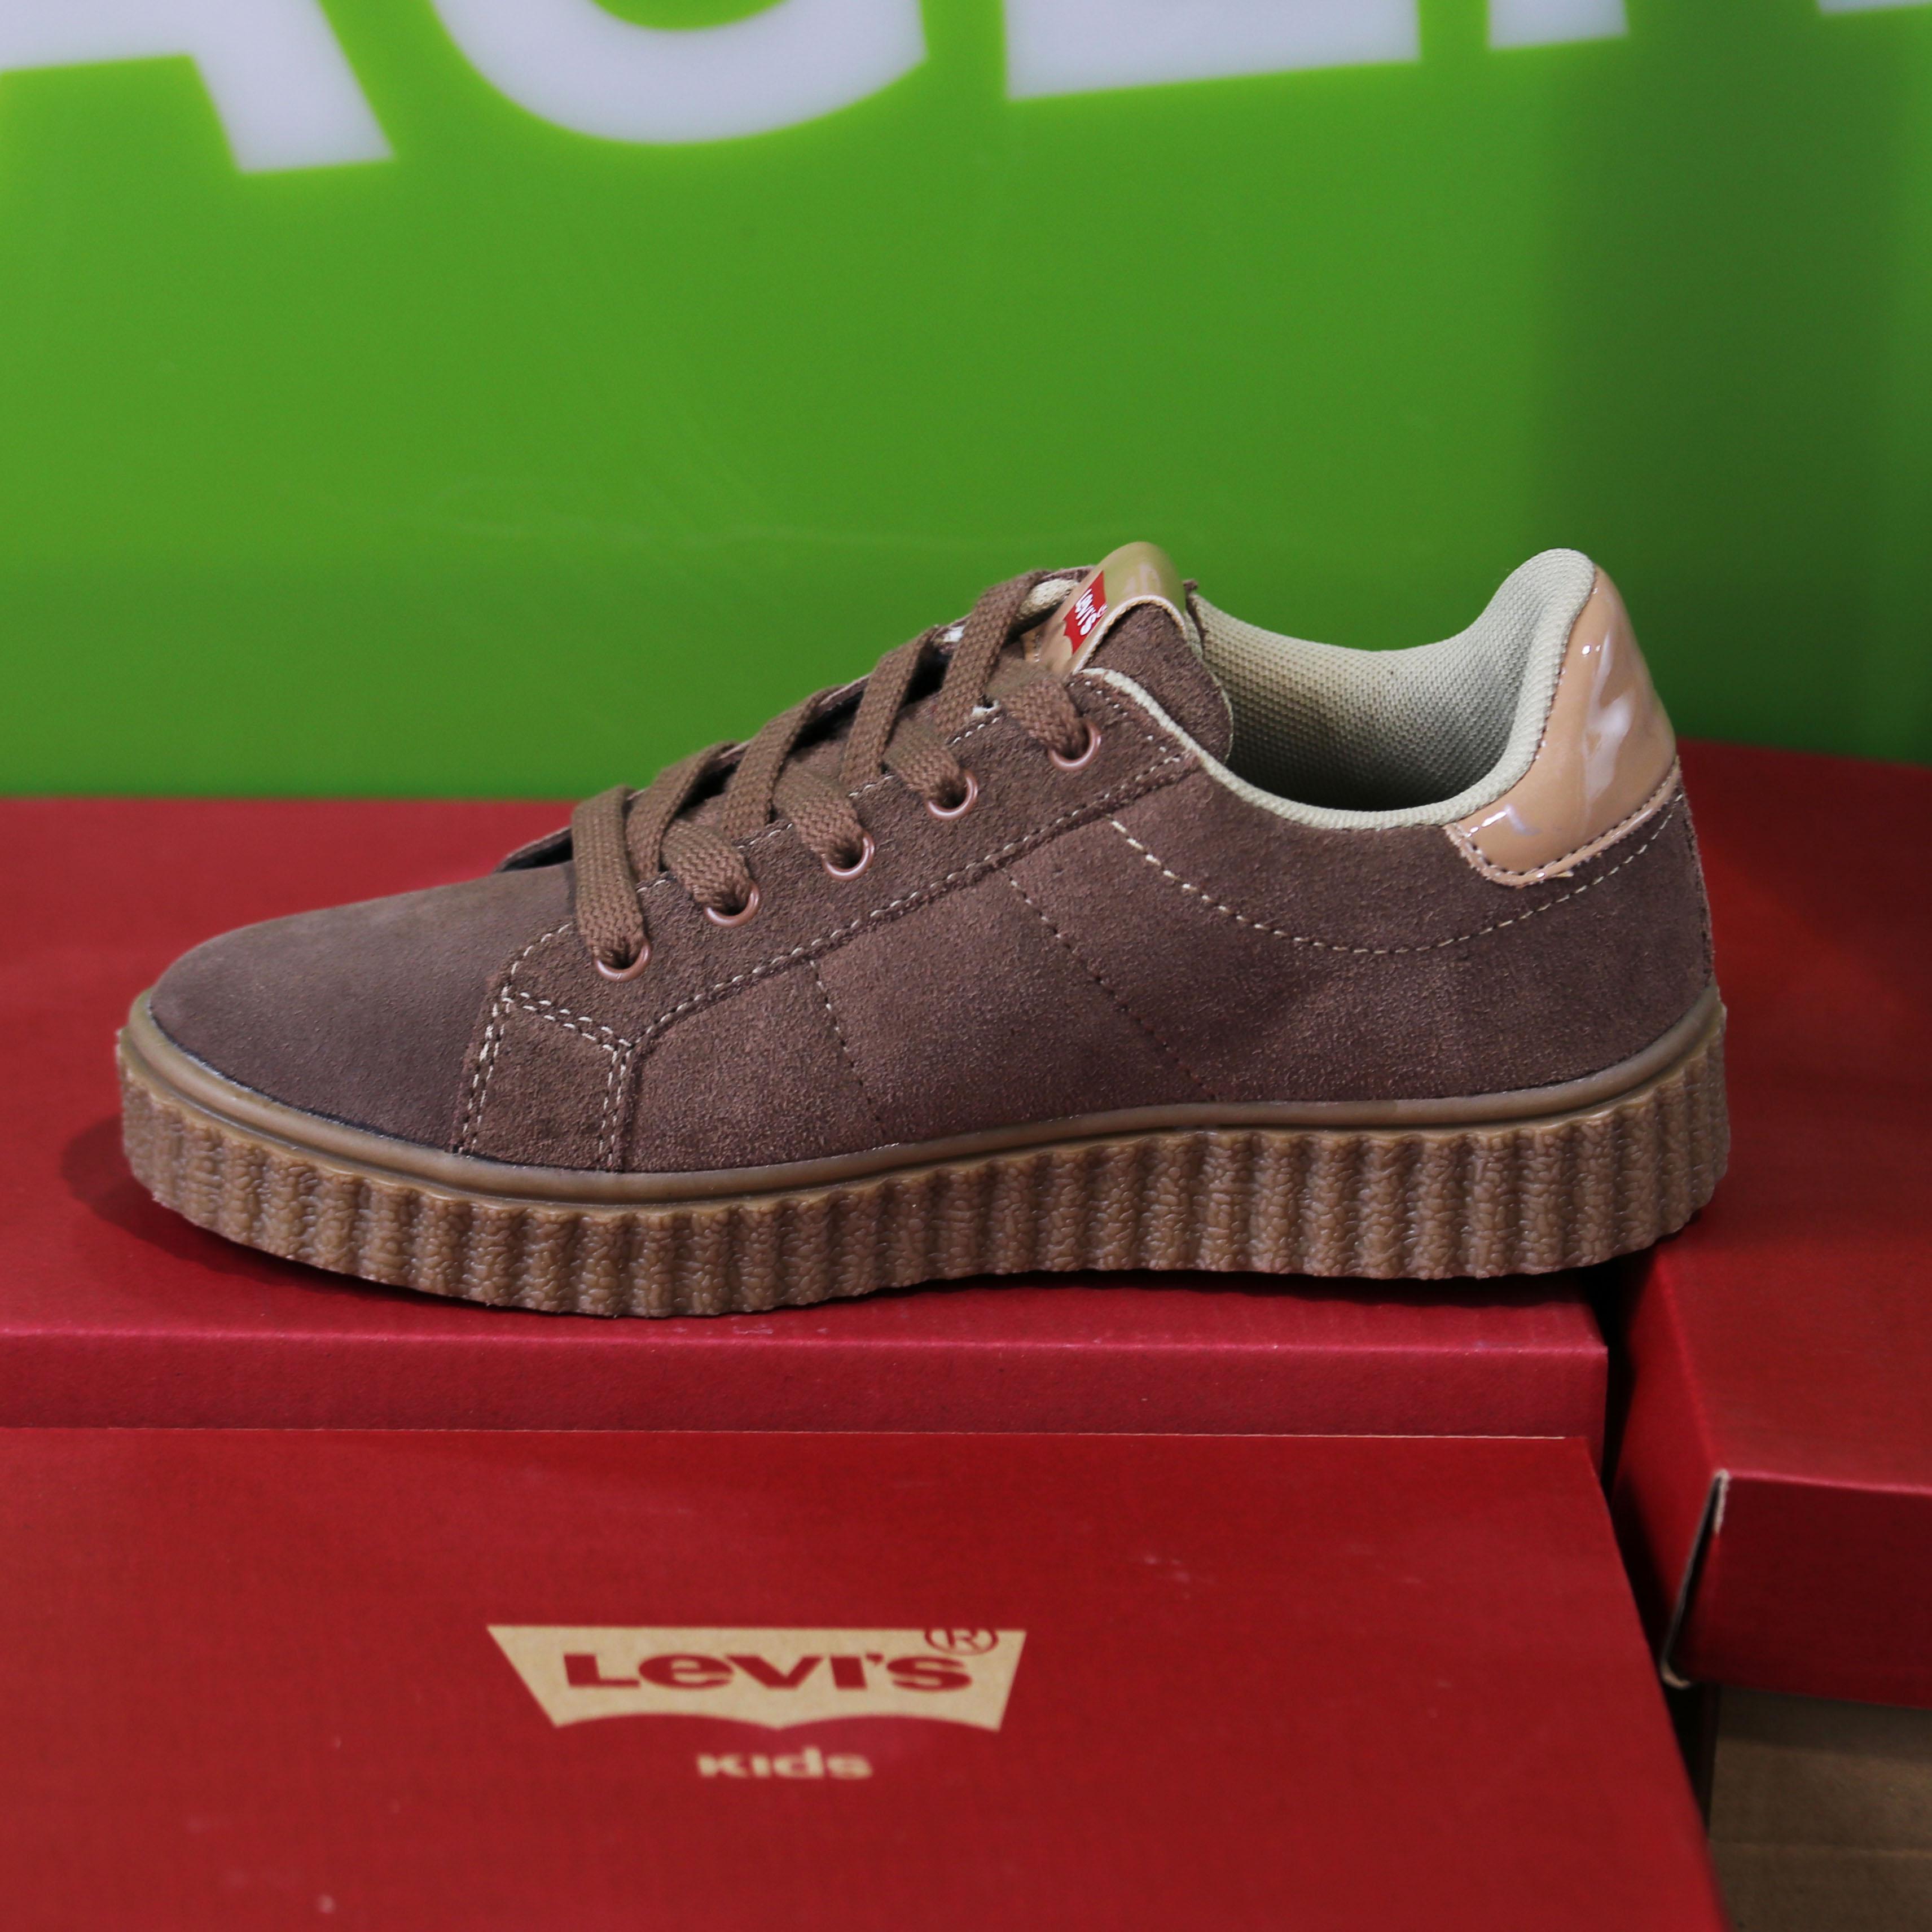 levis kids – new england brun sko barn dame sneakers3